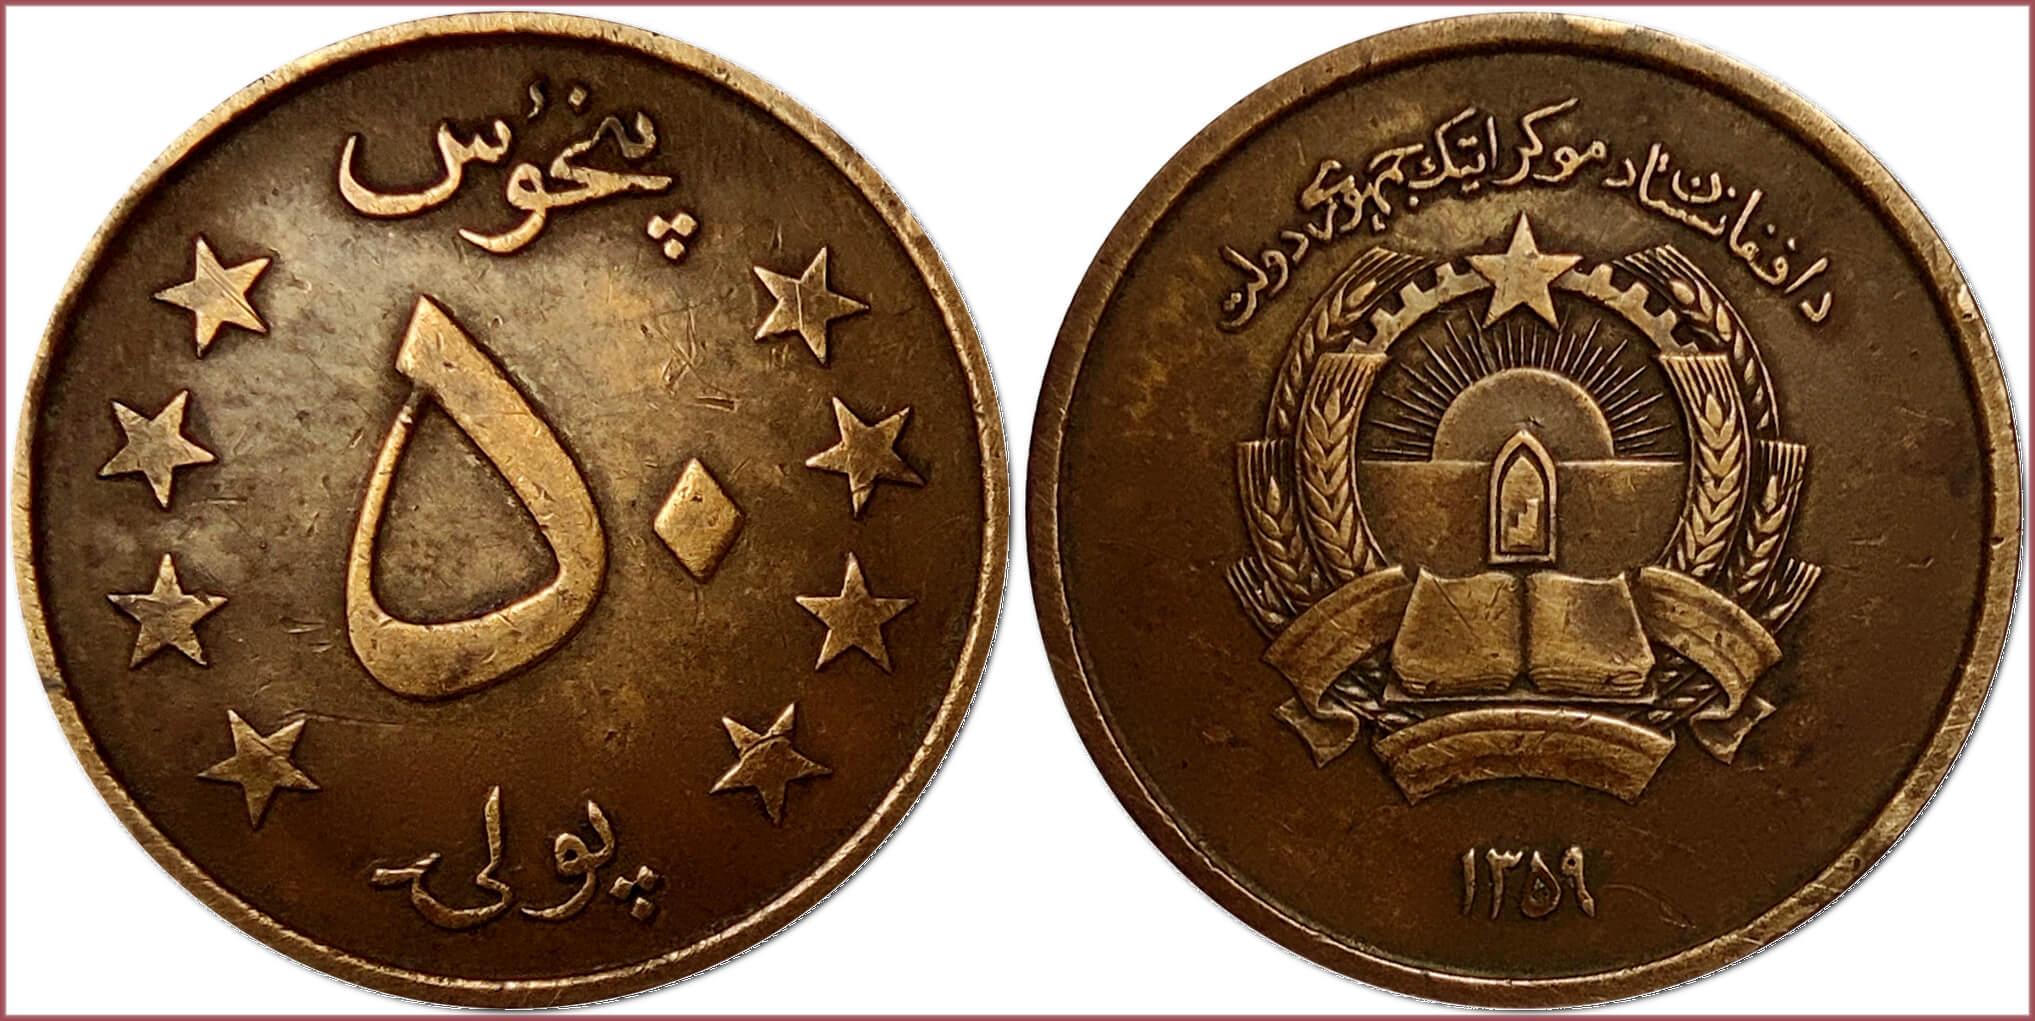 50 pul, 1980: Democratic Republic of Afghanistan